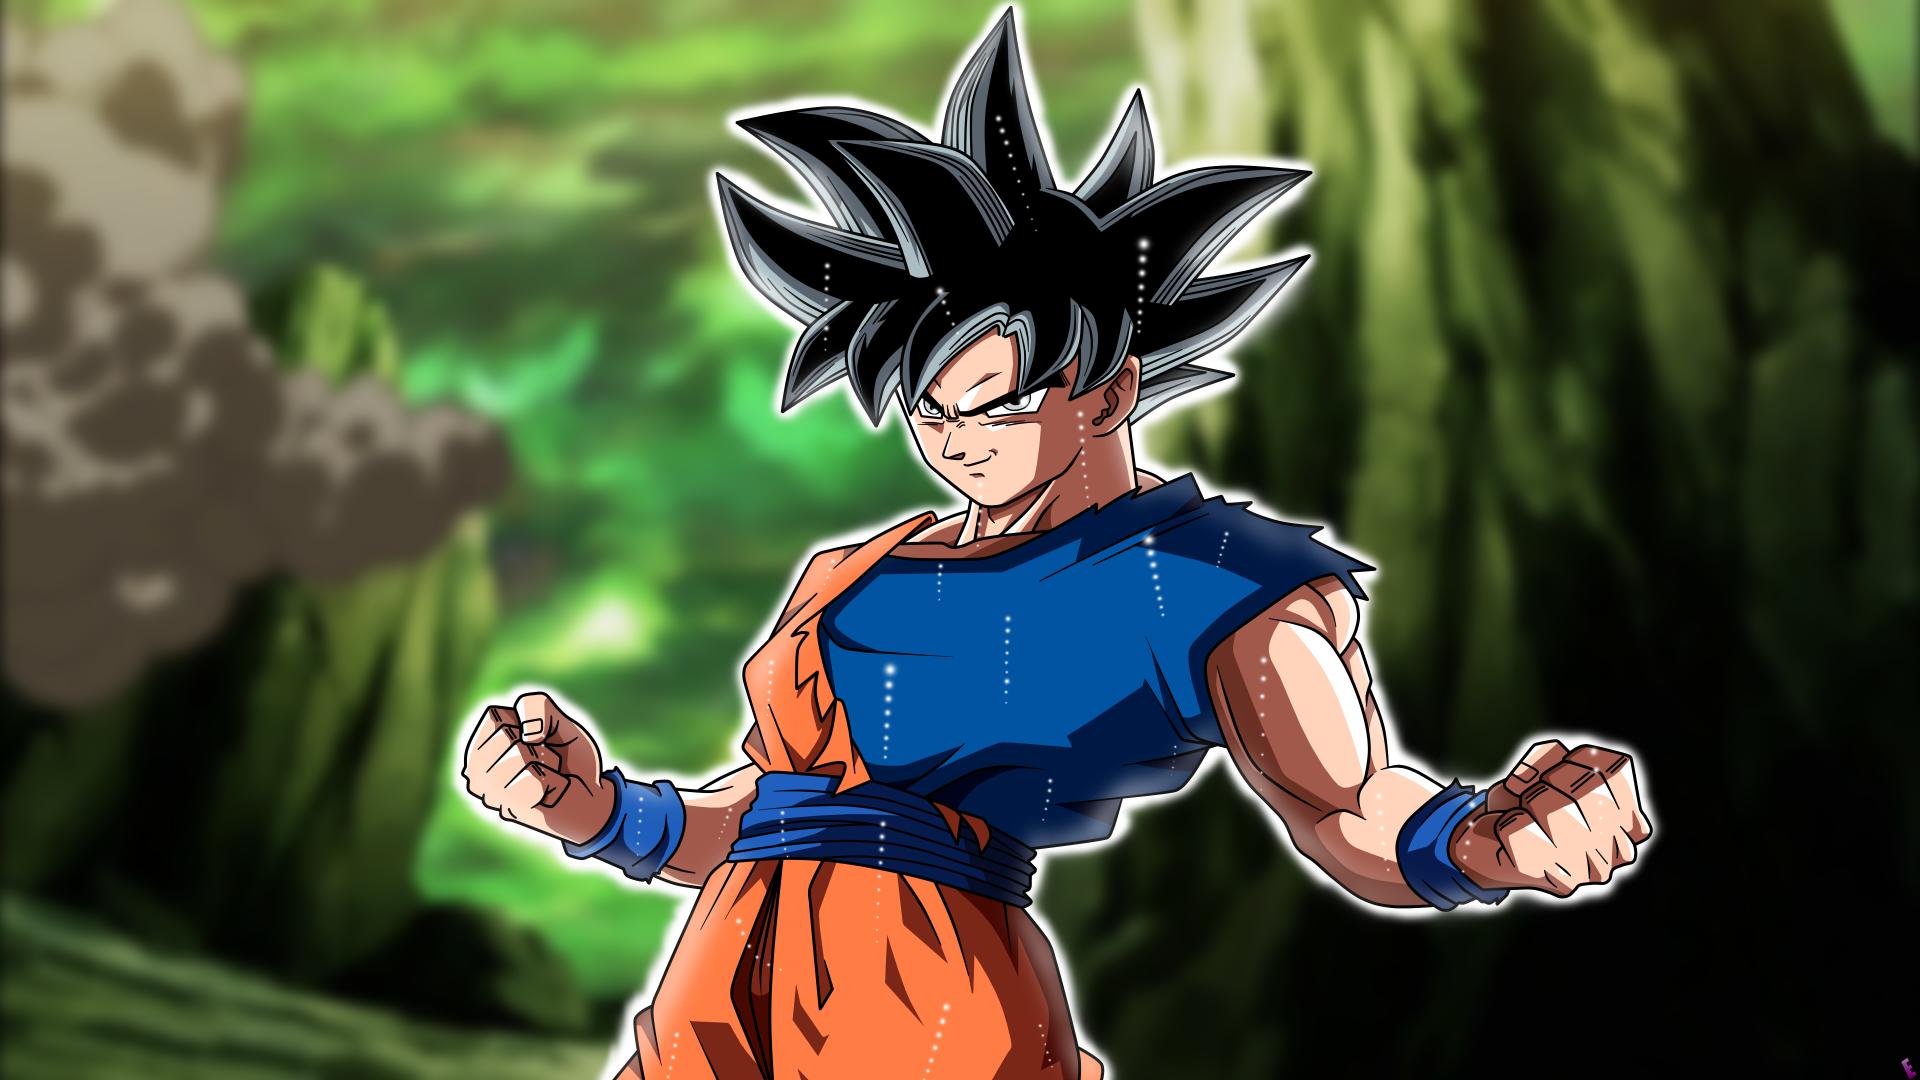 Goku 5k retina ultra hd fond d 39 cran and arri re plan for Fond ecran goku